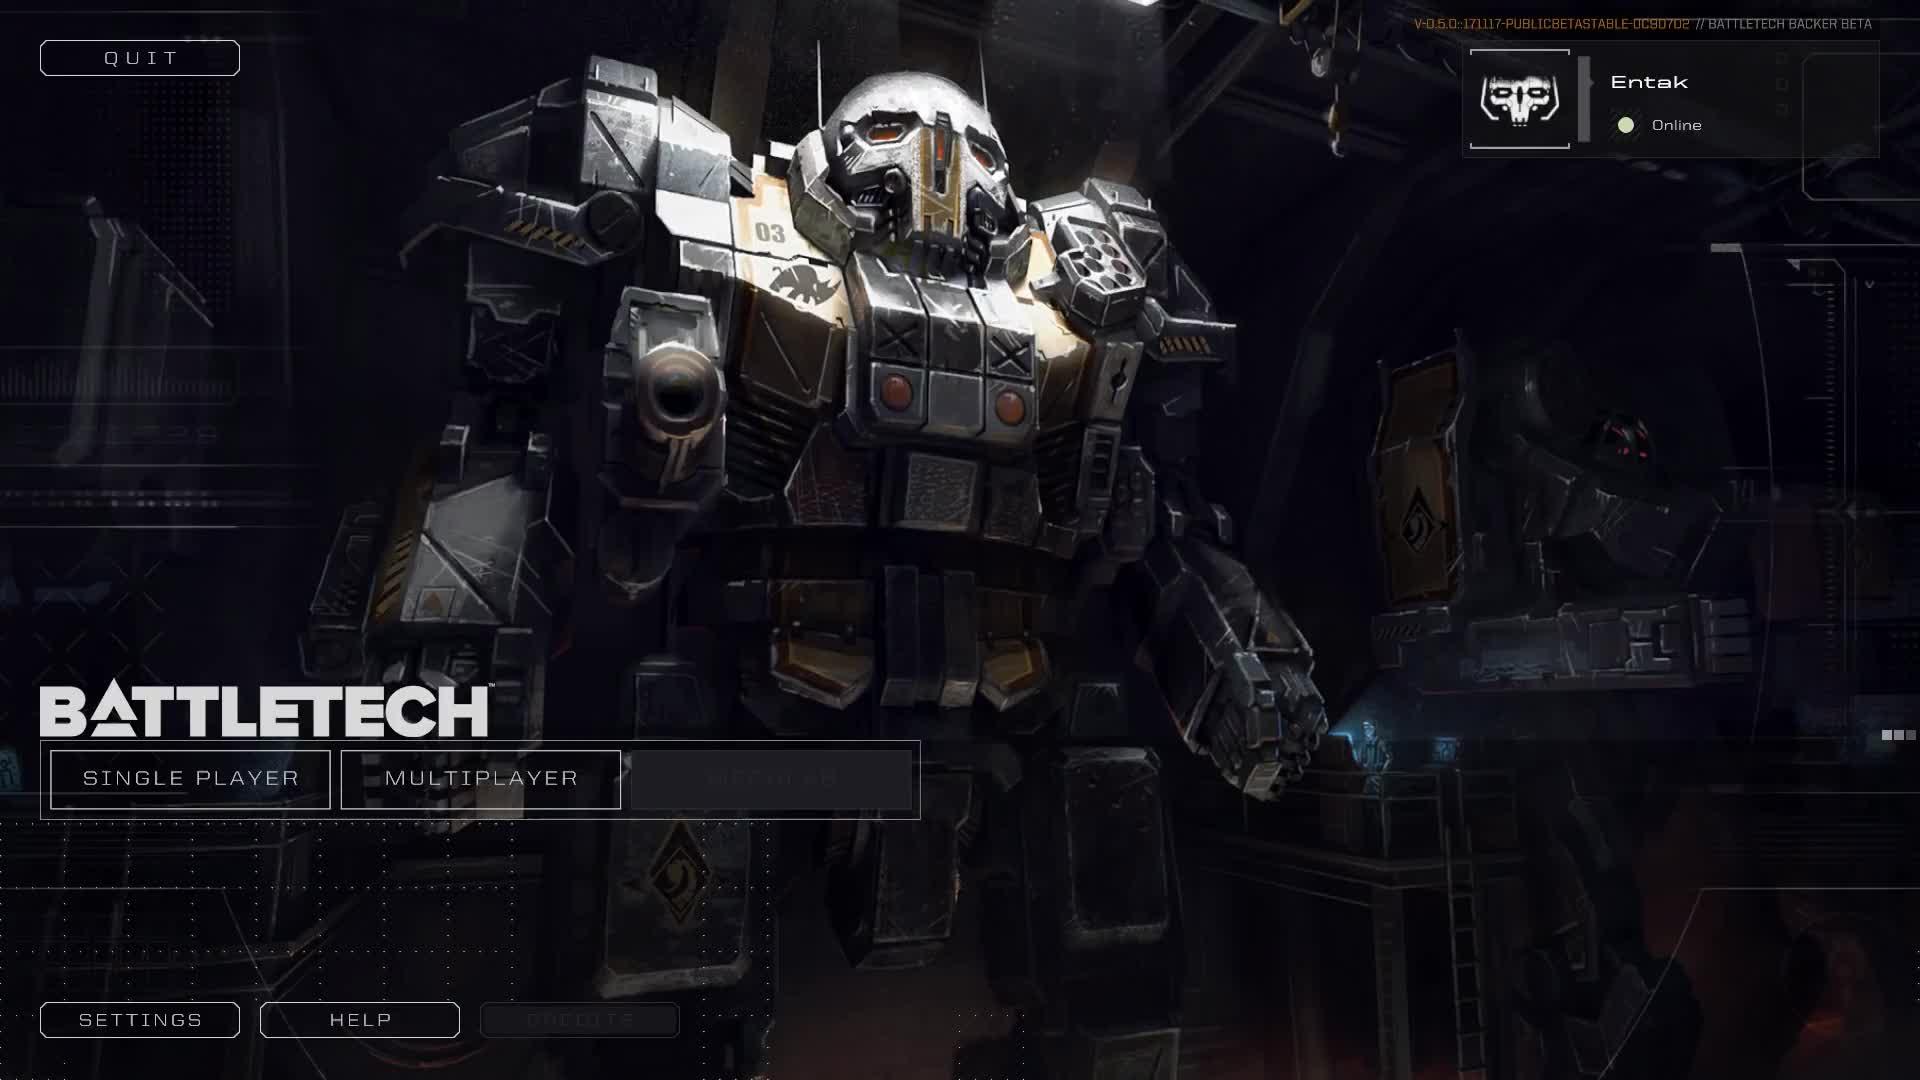 Mechwarrior 5 Mercenaries Gifs Search | Search & Share on Homdor